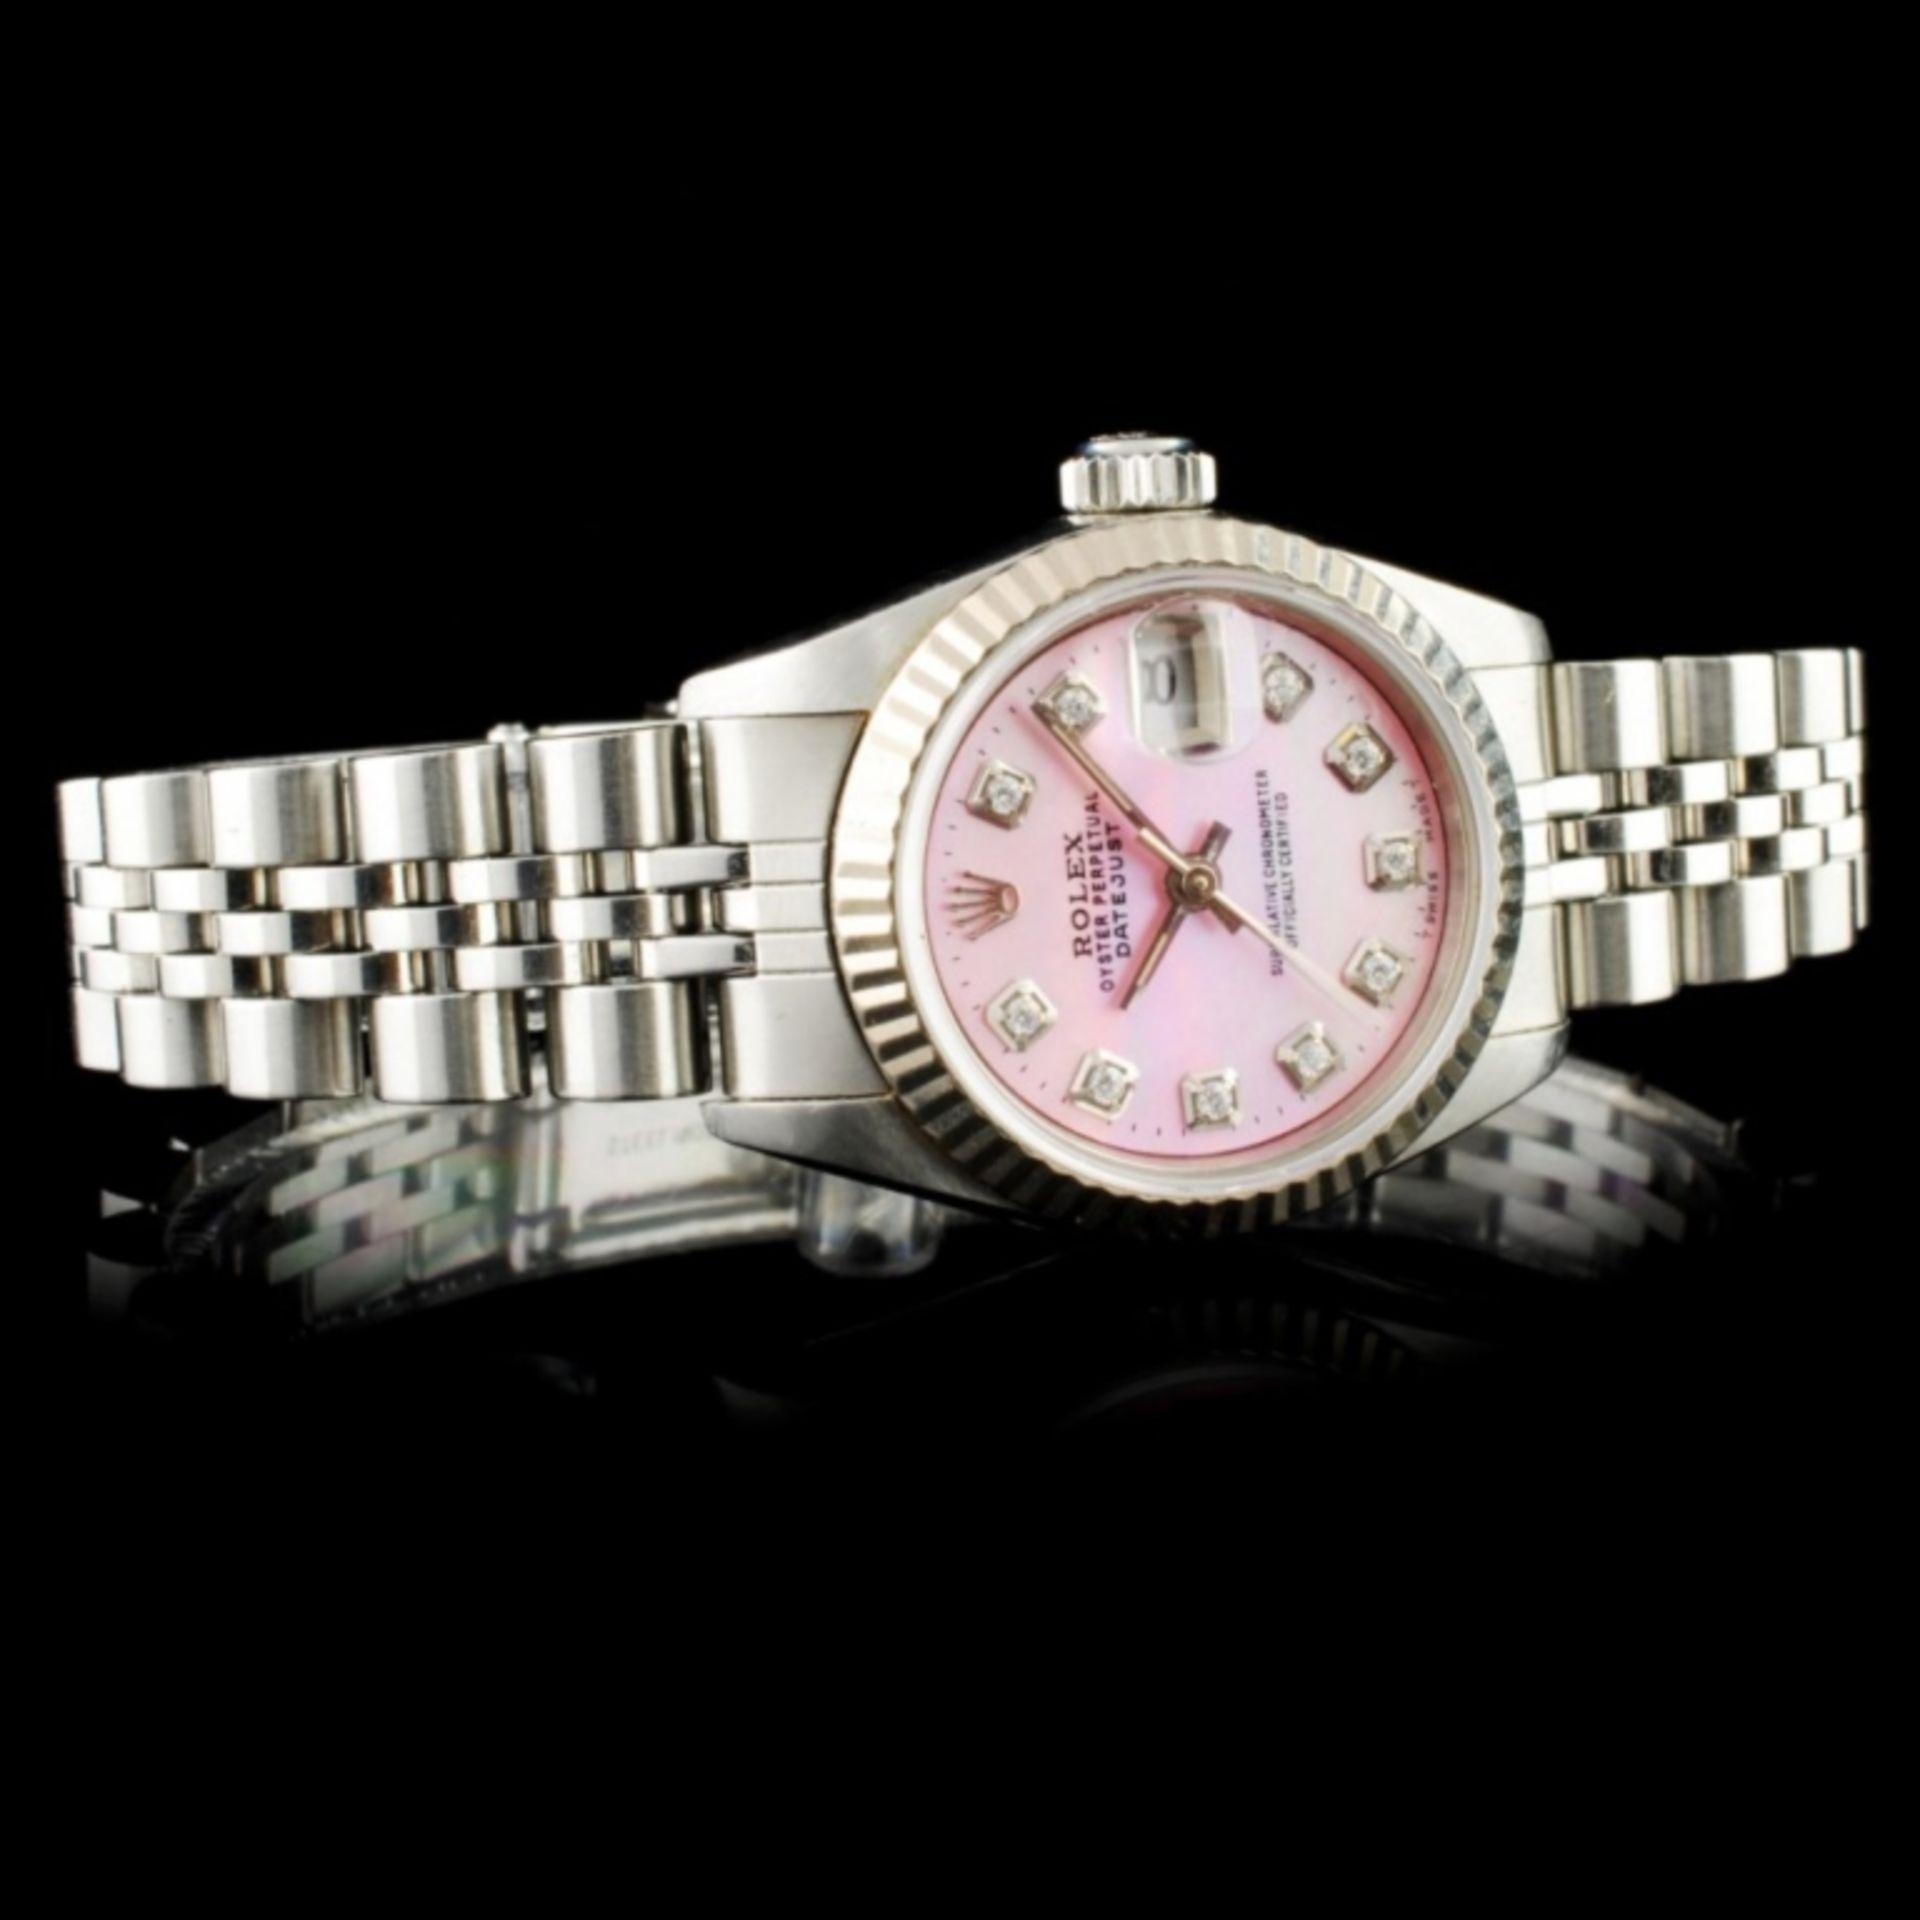 Rolex DateJust 18K & SS Ladies Wristwatch - Image 2 of 6